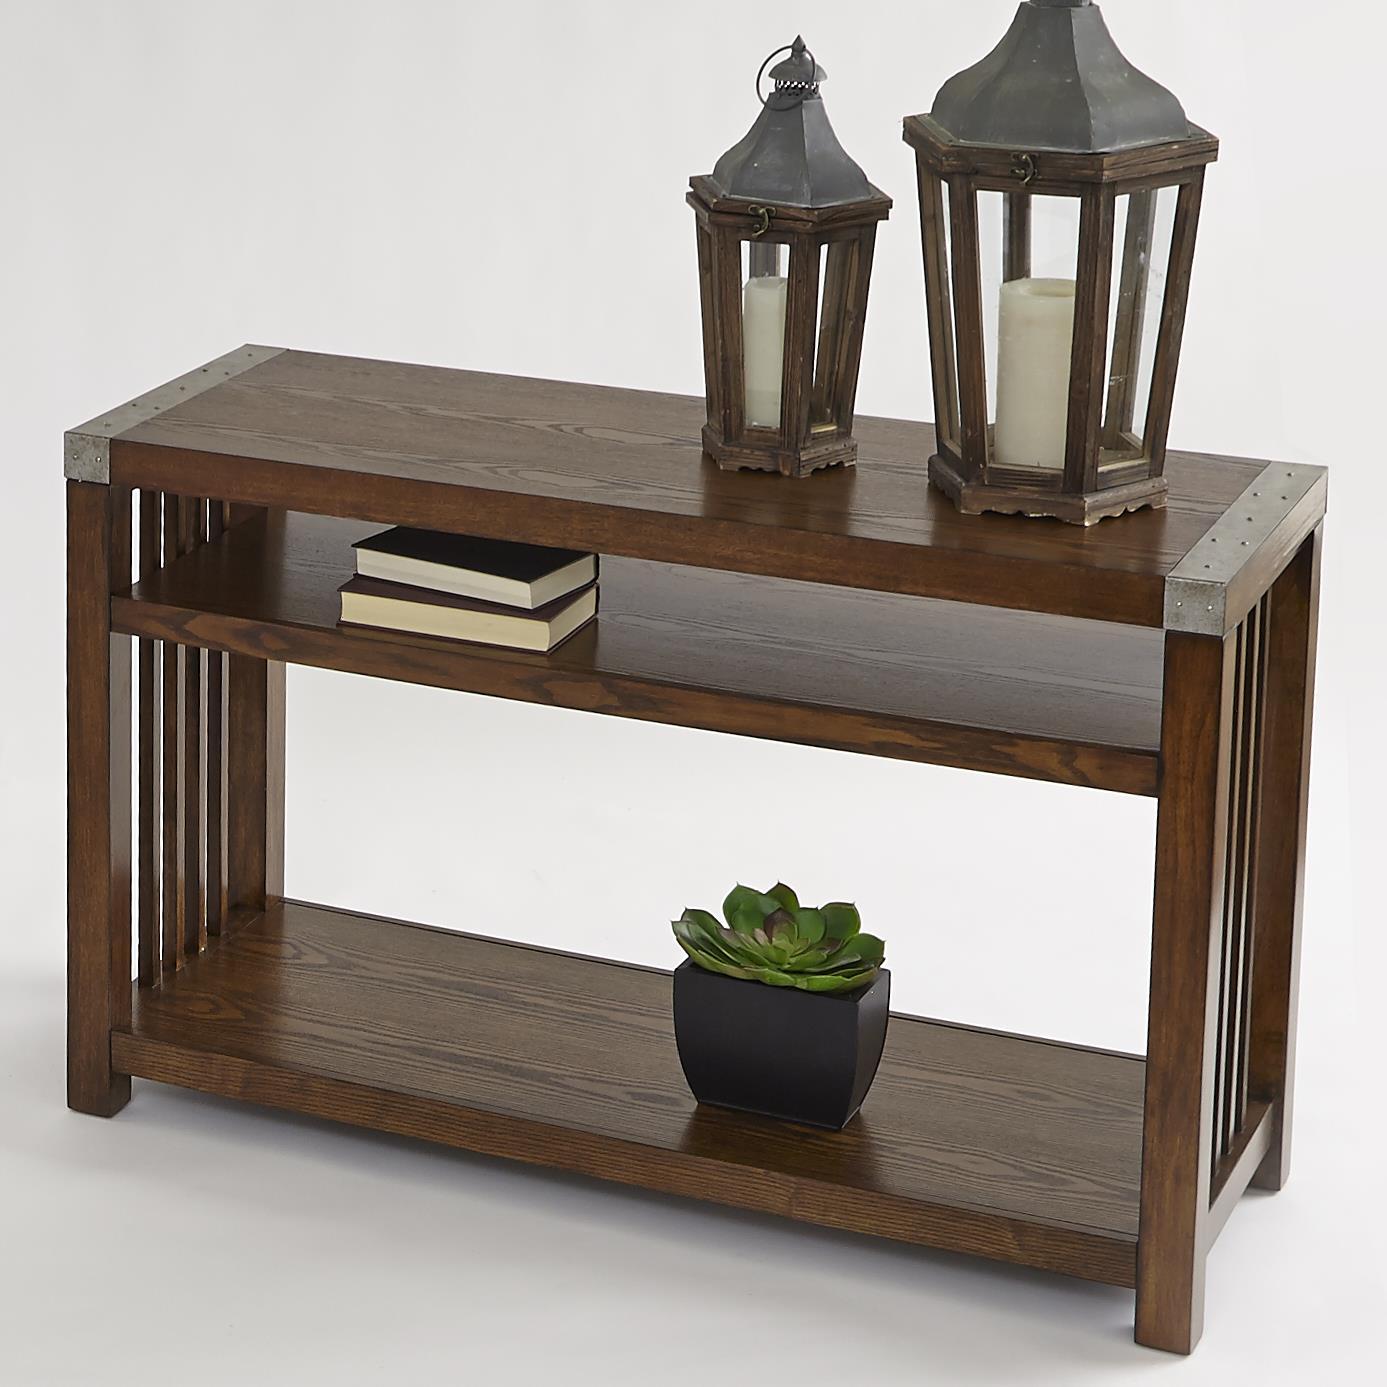 Progressive Furniture Mason Hills Sofa/Console Table - Item Number: P266-05